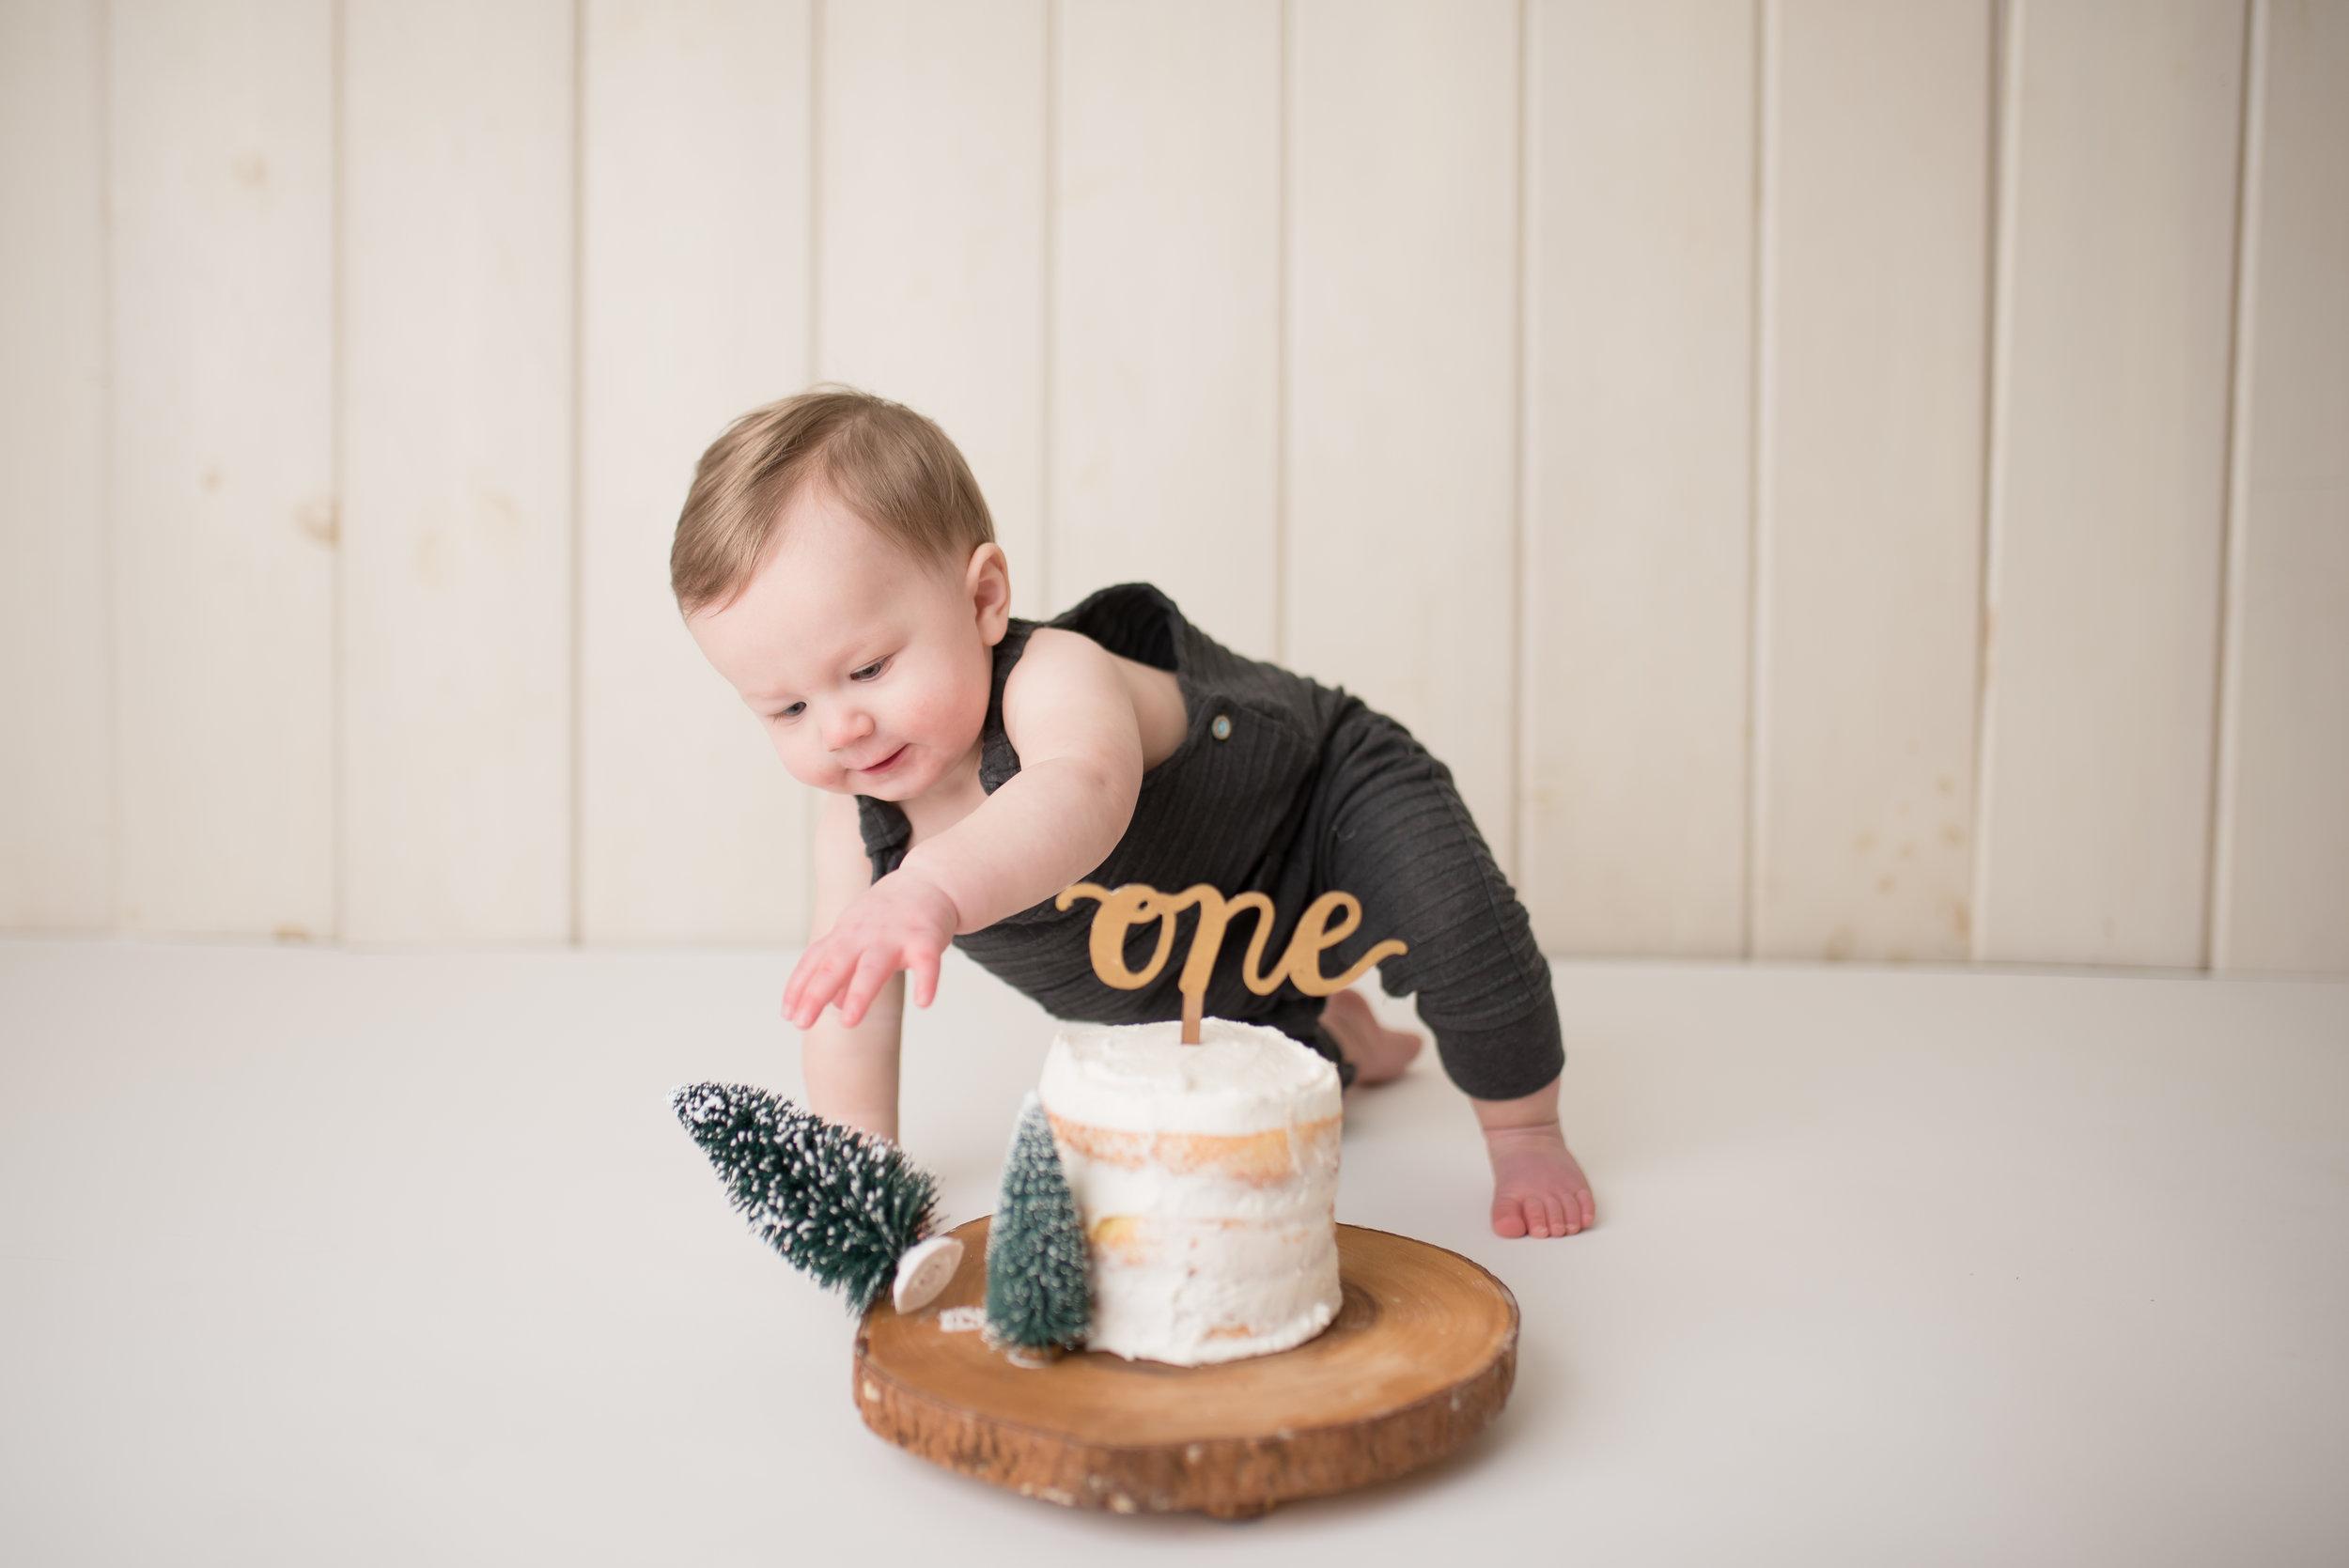 Nicole Starr Photography | Saratoga Springs Cake Smash Photographer | Boston Cake Smash Photographer | Saratoga Springs Family Photographer | Boston Family Photographer  Delmar NY Cake Smash Photographer | Loudonville NY Cake Smash Photographer